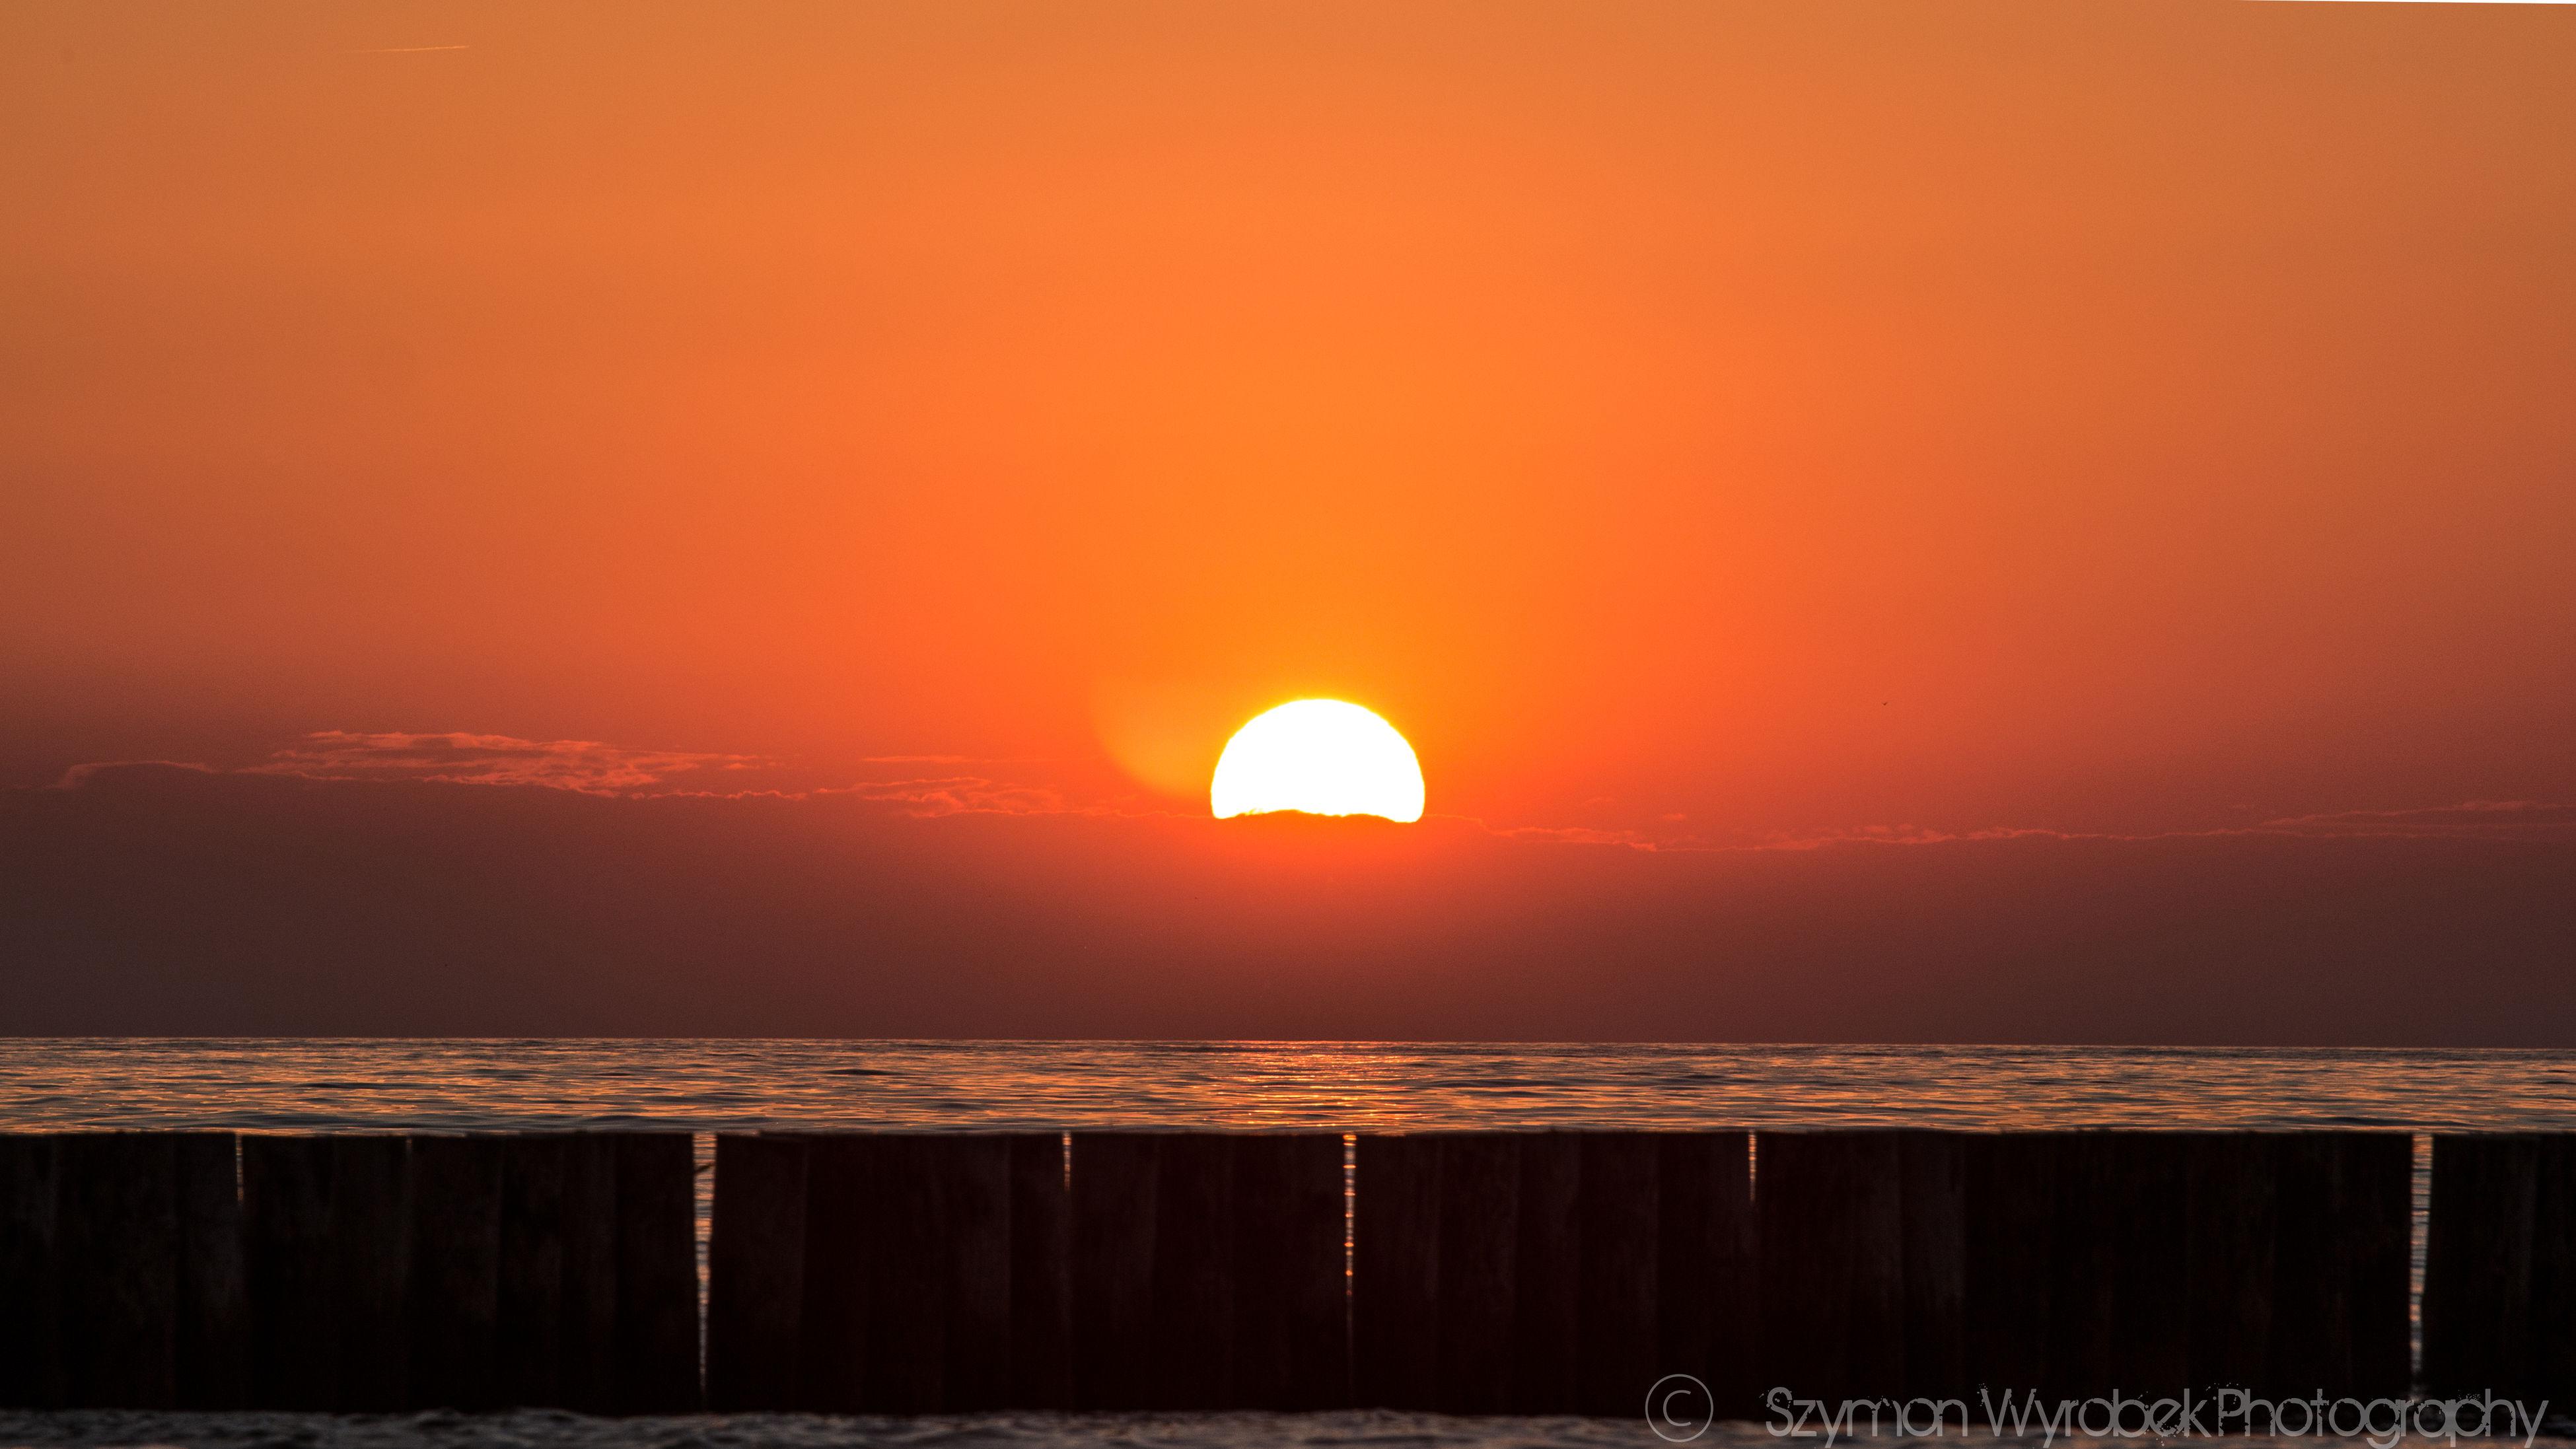 sunset, orange color, horizon over water, sea, scenics, sun, beauty in nature, tranquil scene, water, tranquility, idyllic, sky, nature, remote, outdoors, majestic, no people, non-urban scene, dramatic sky, cloud - sky, seascape, calm, cloud